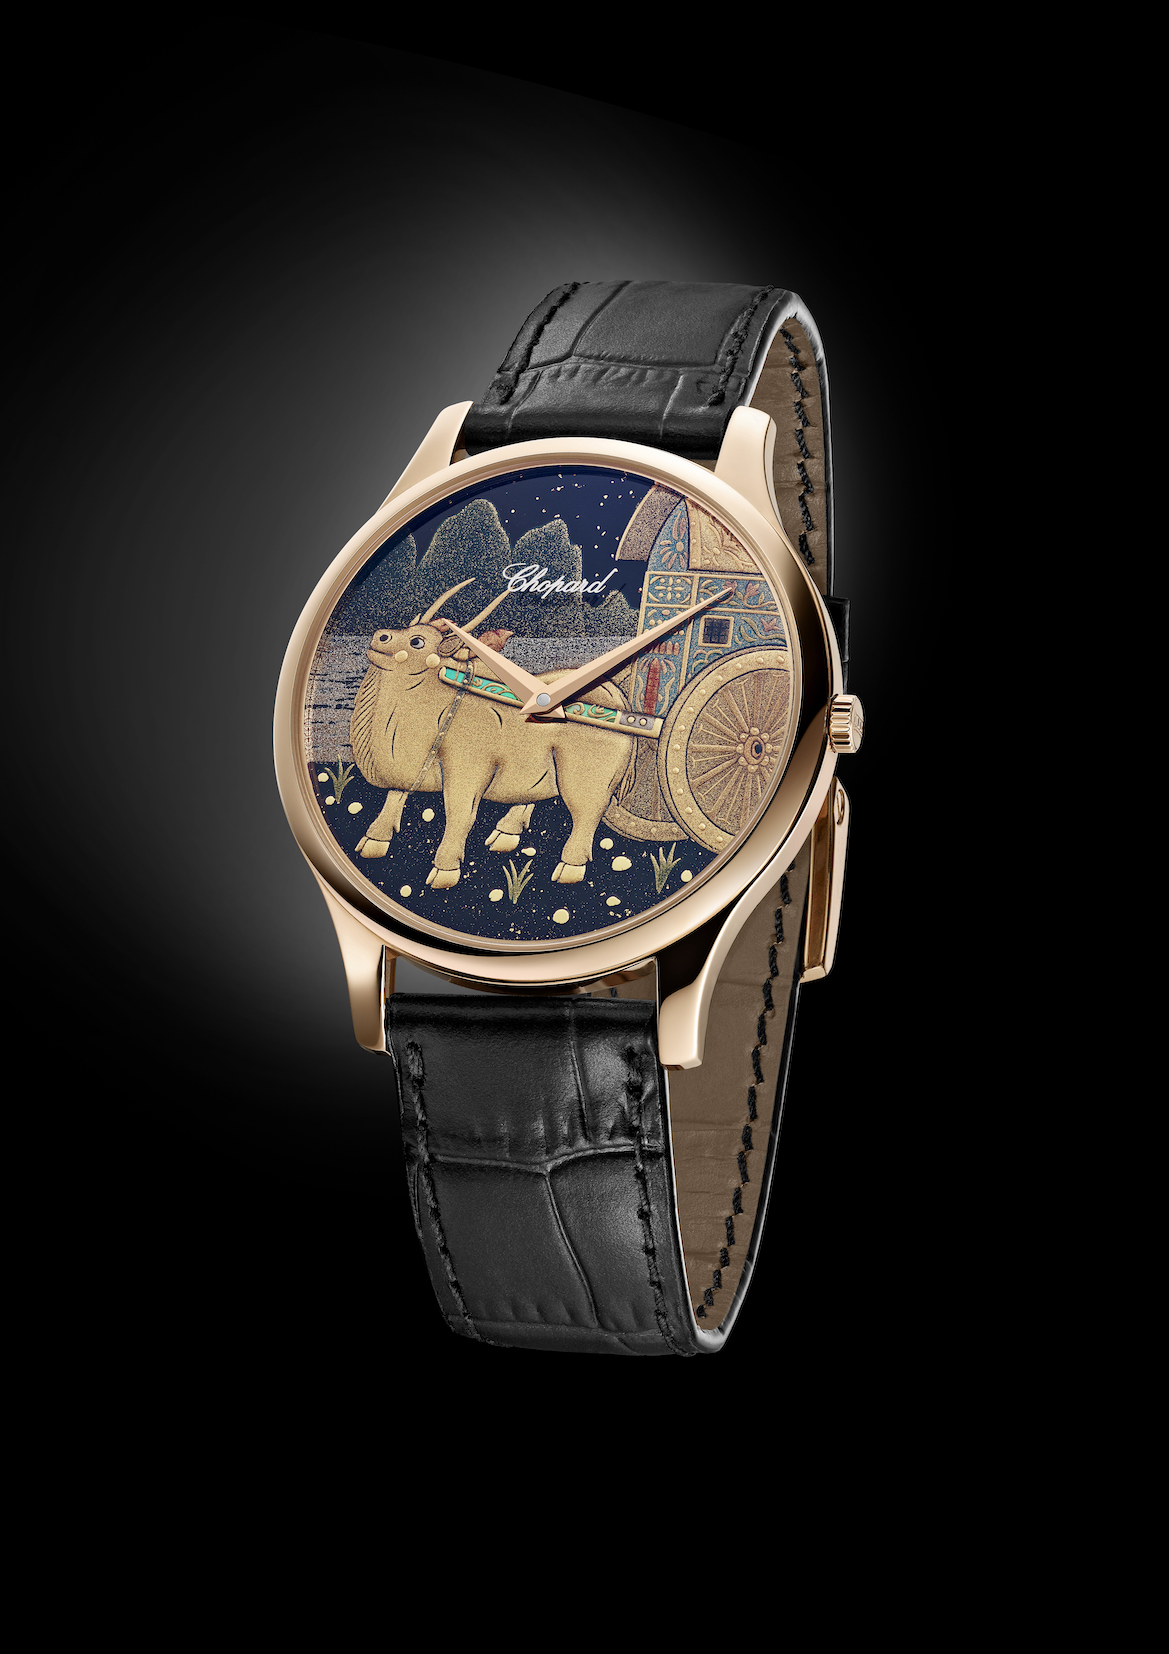 Chopard L.U.C XP Urushi Year of the Ox watch.